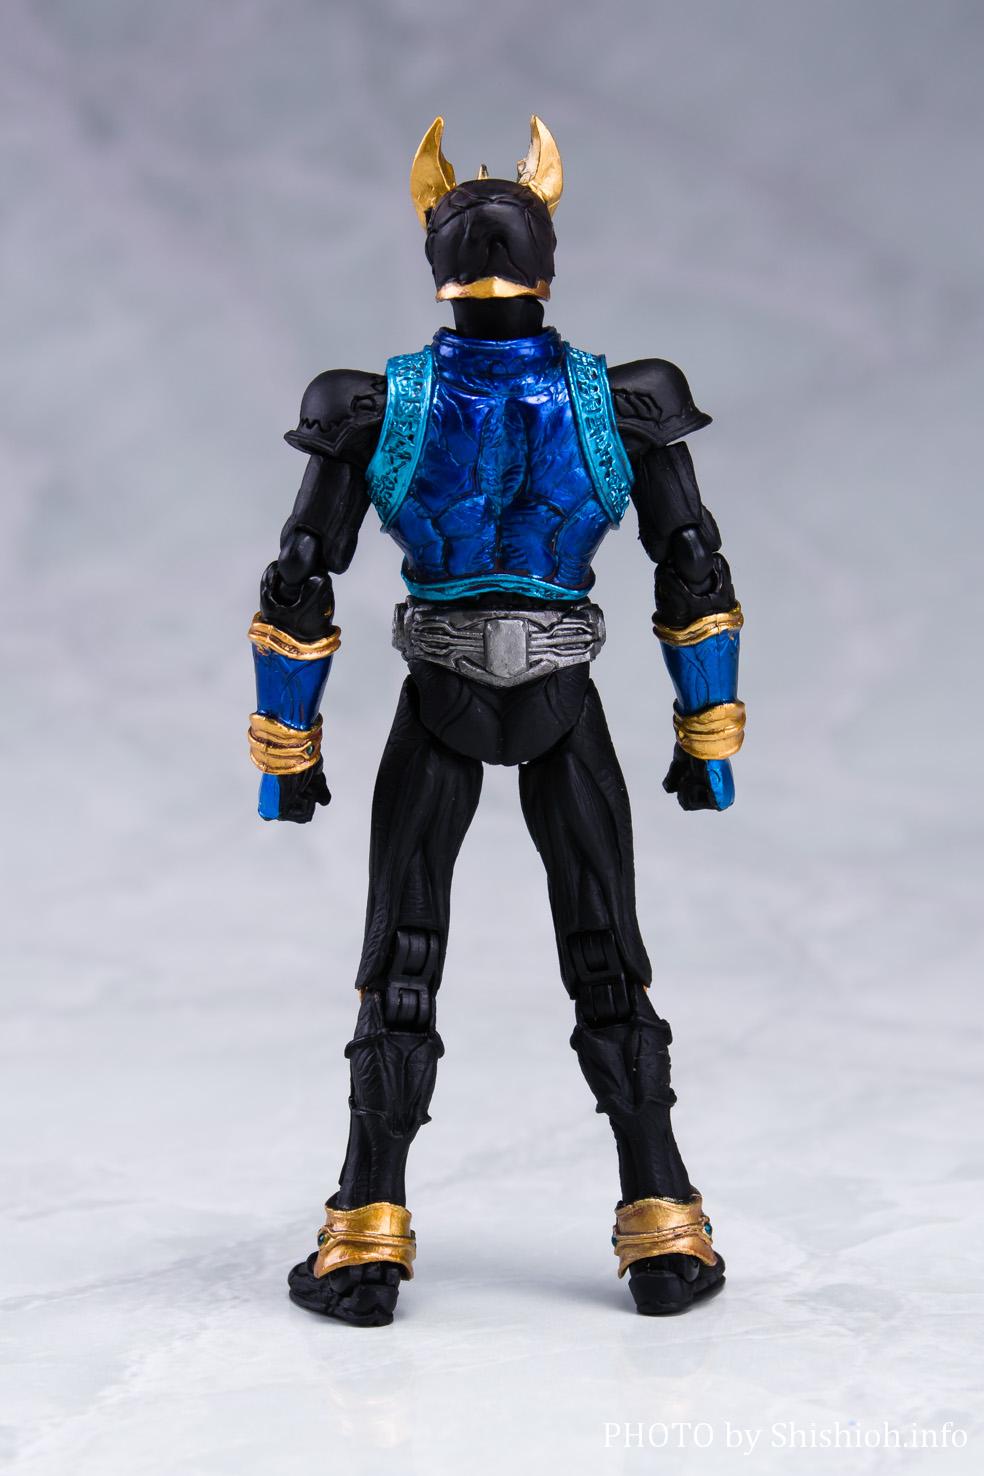 S.I.C.極魂 仮面ライダークウガ 3フォームセット(ドラゴンフォーム、ペガサスフォーム、タイタンフォーム)